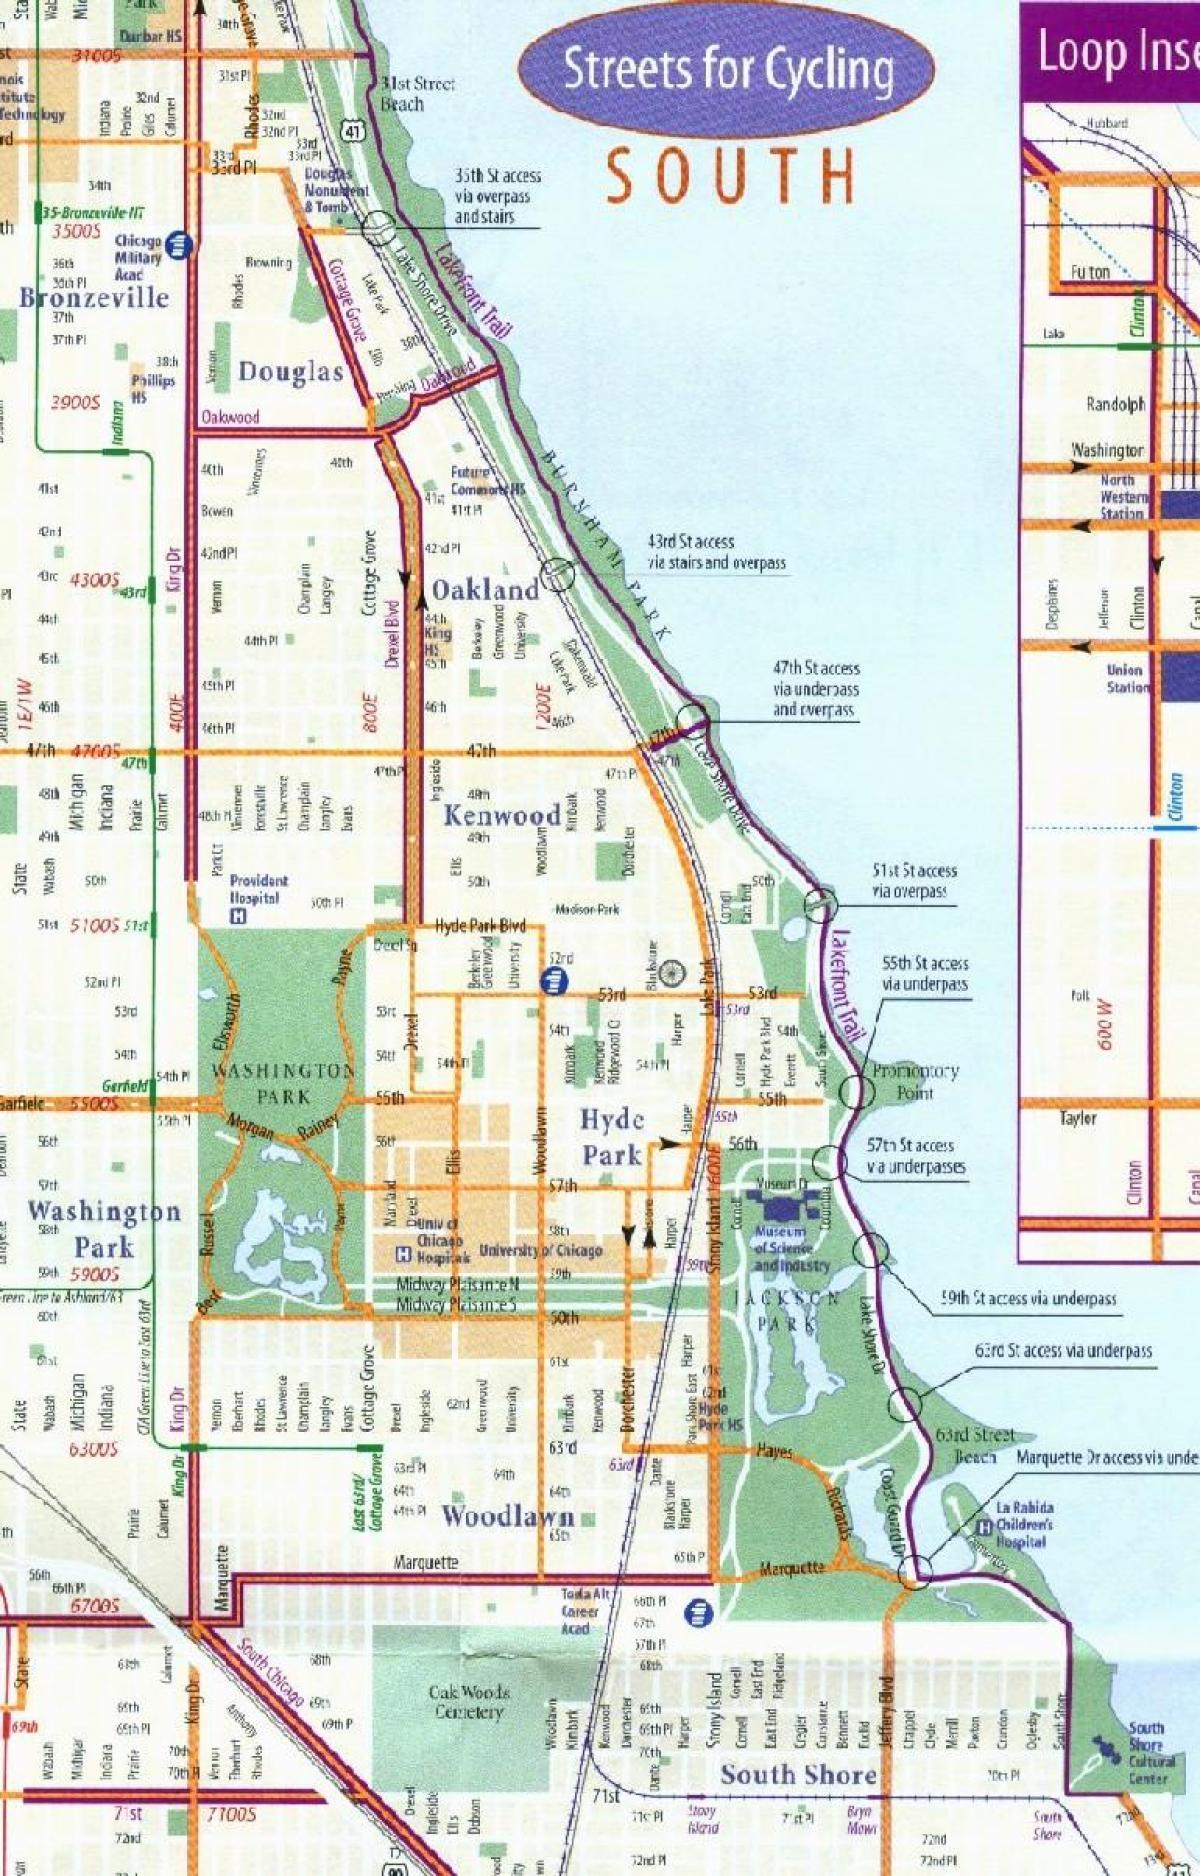 sykkel kart Chicago sykkel kart   Chicago sykkel kjørefelt kart (Usa) sykkel kart